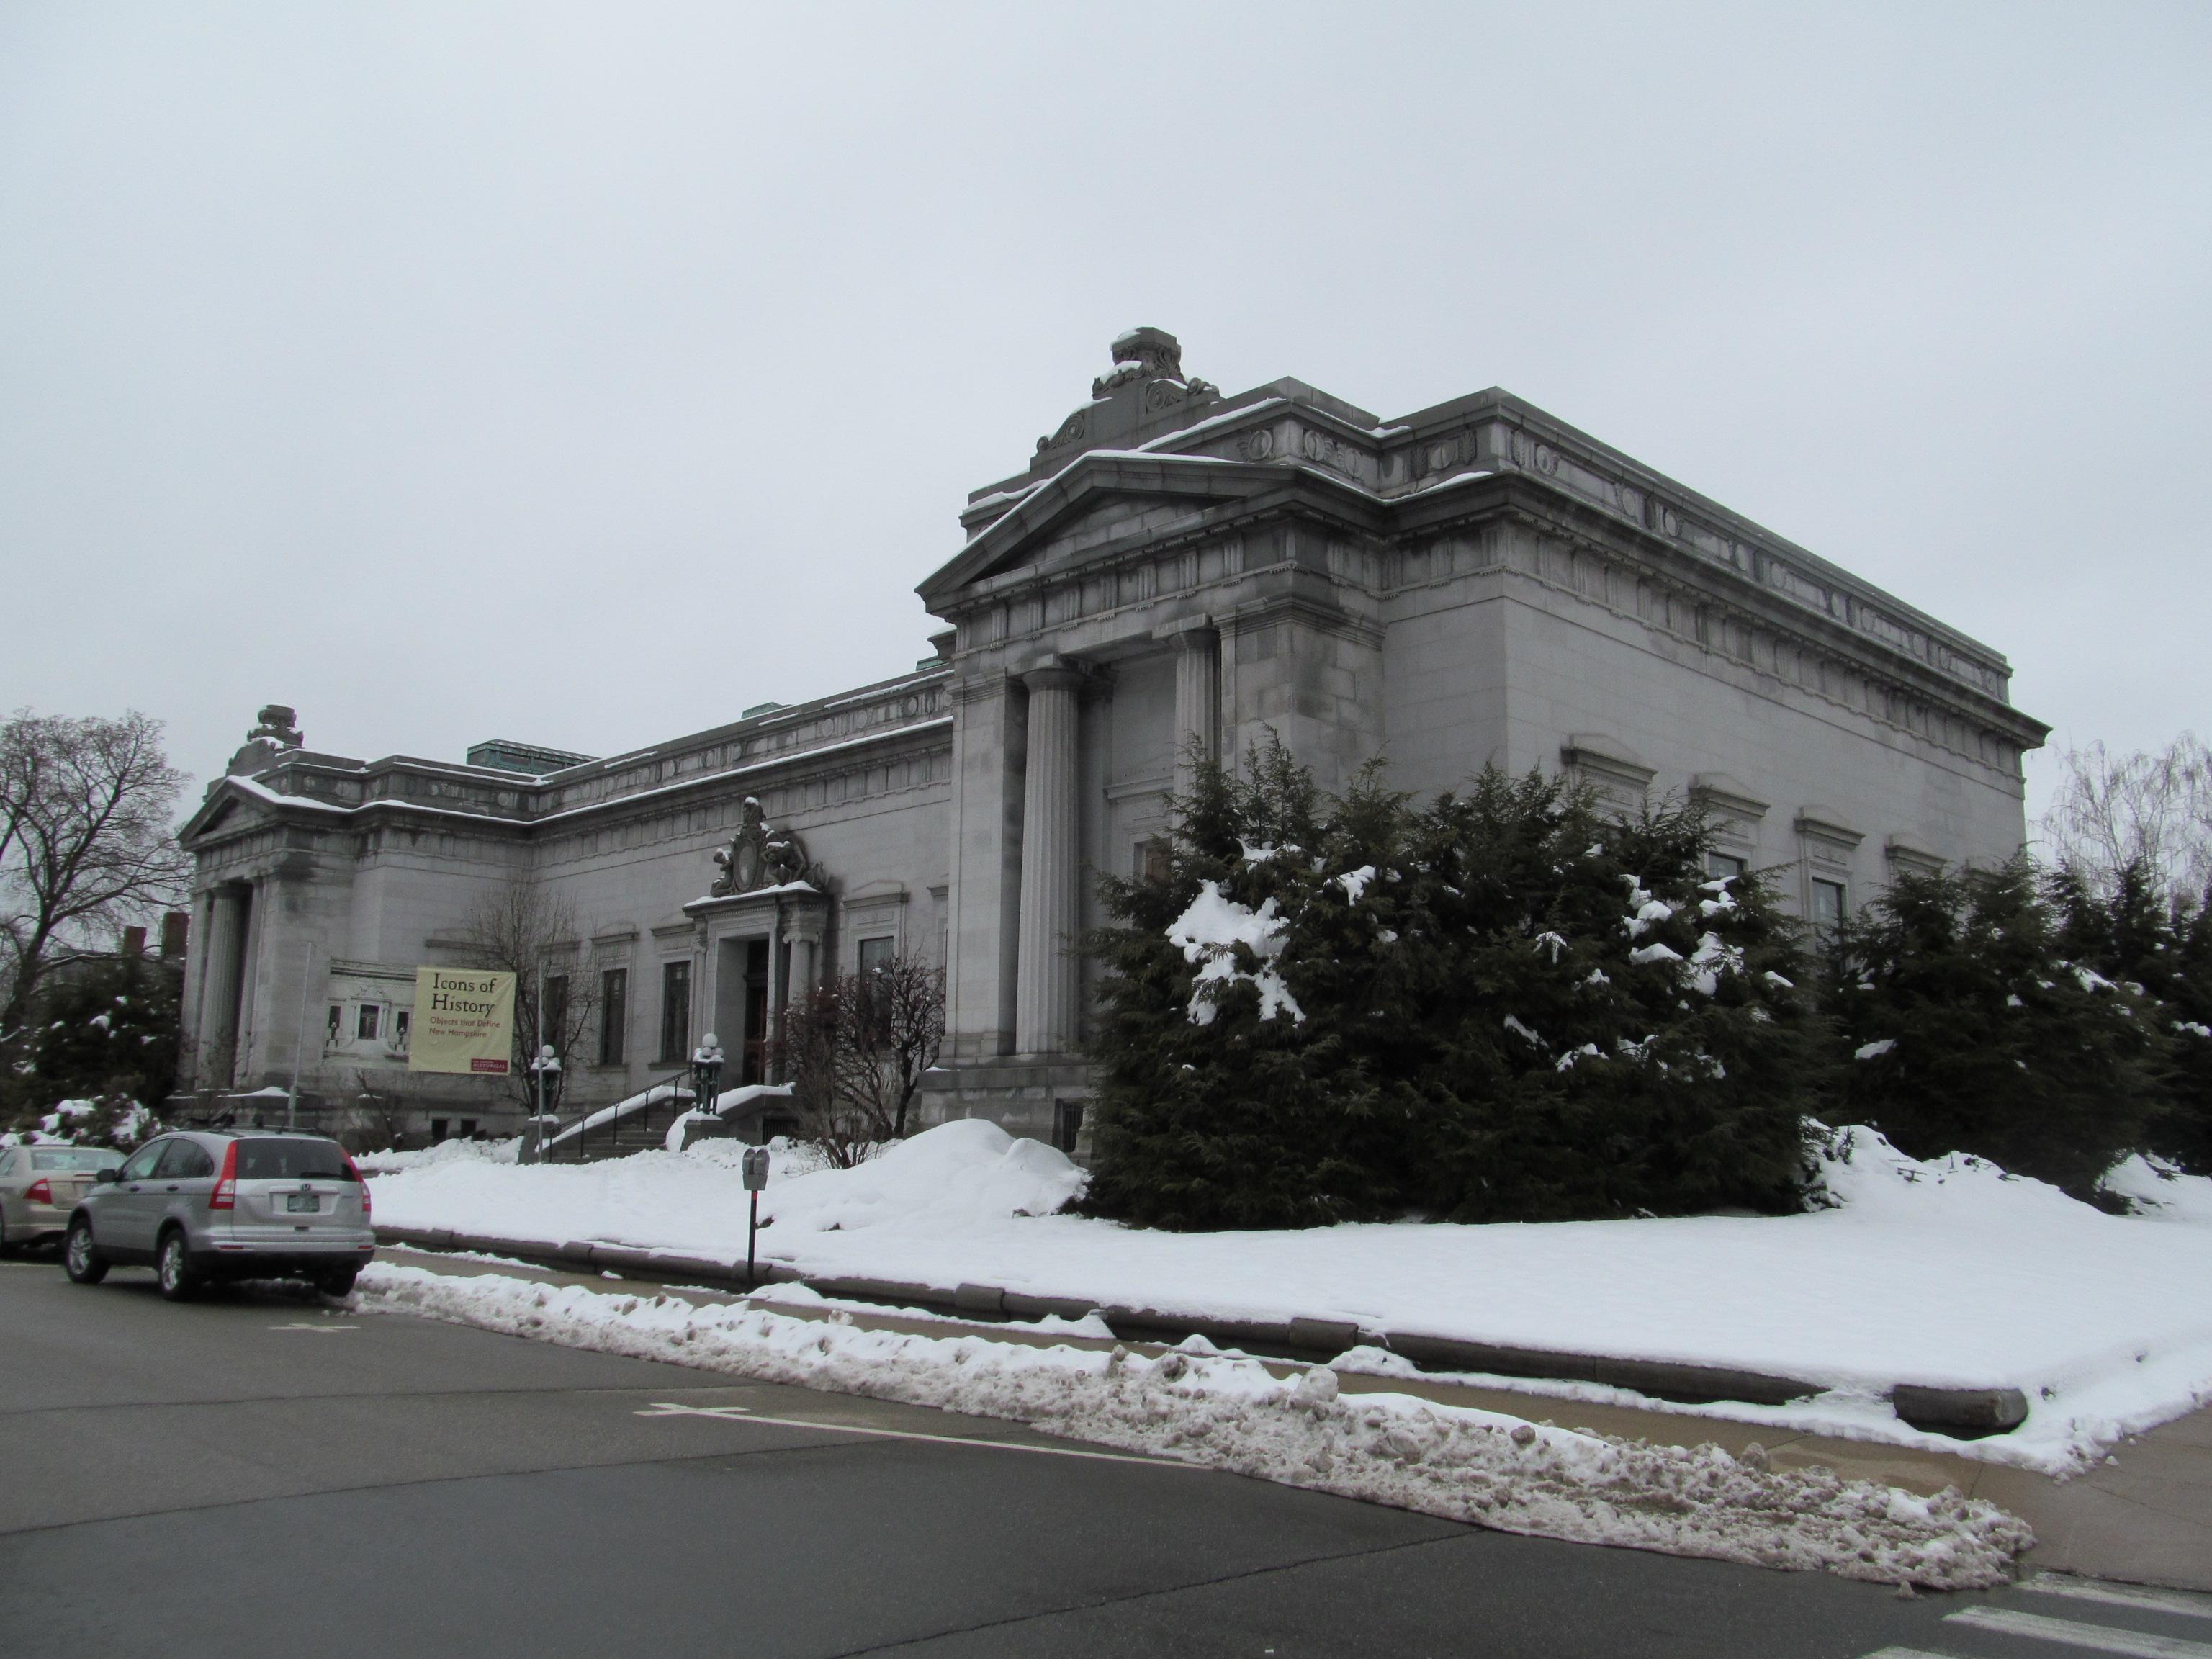 New Hampshire Historical